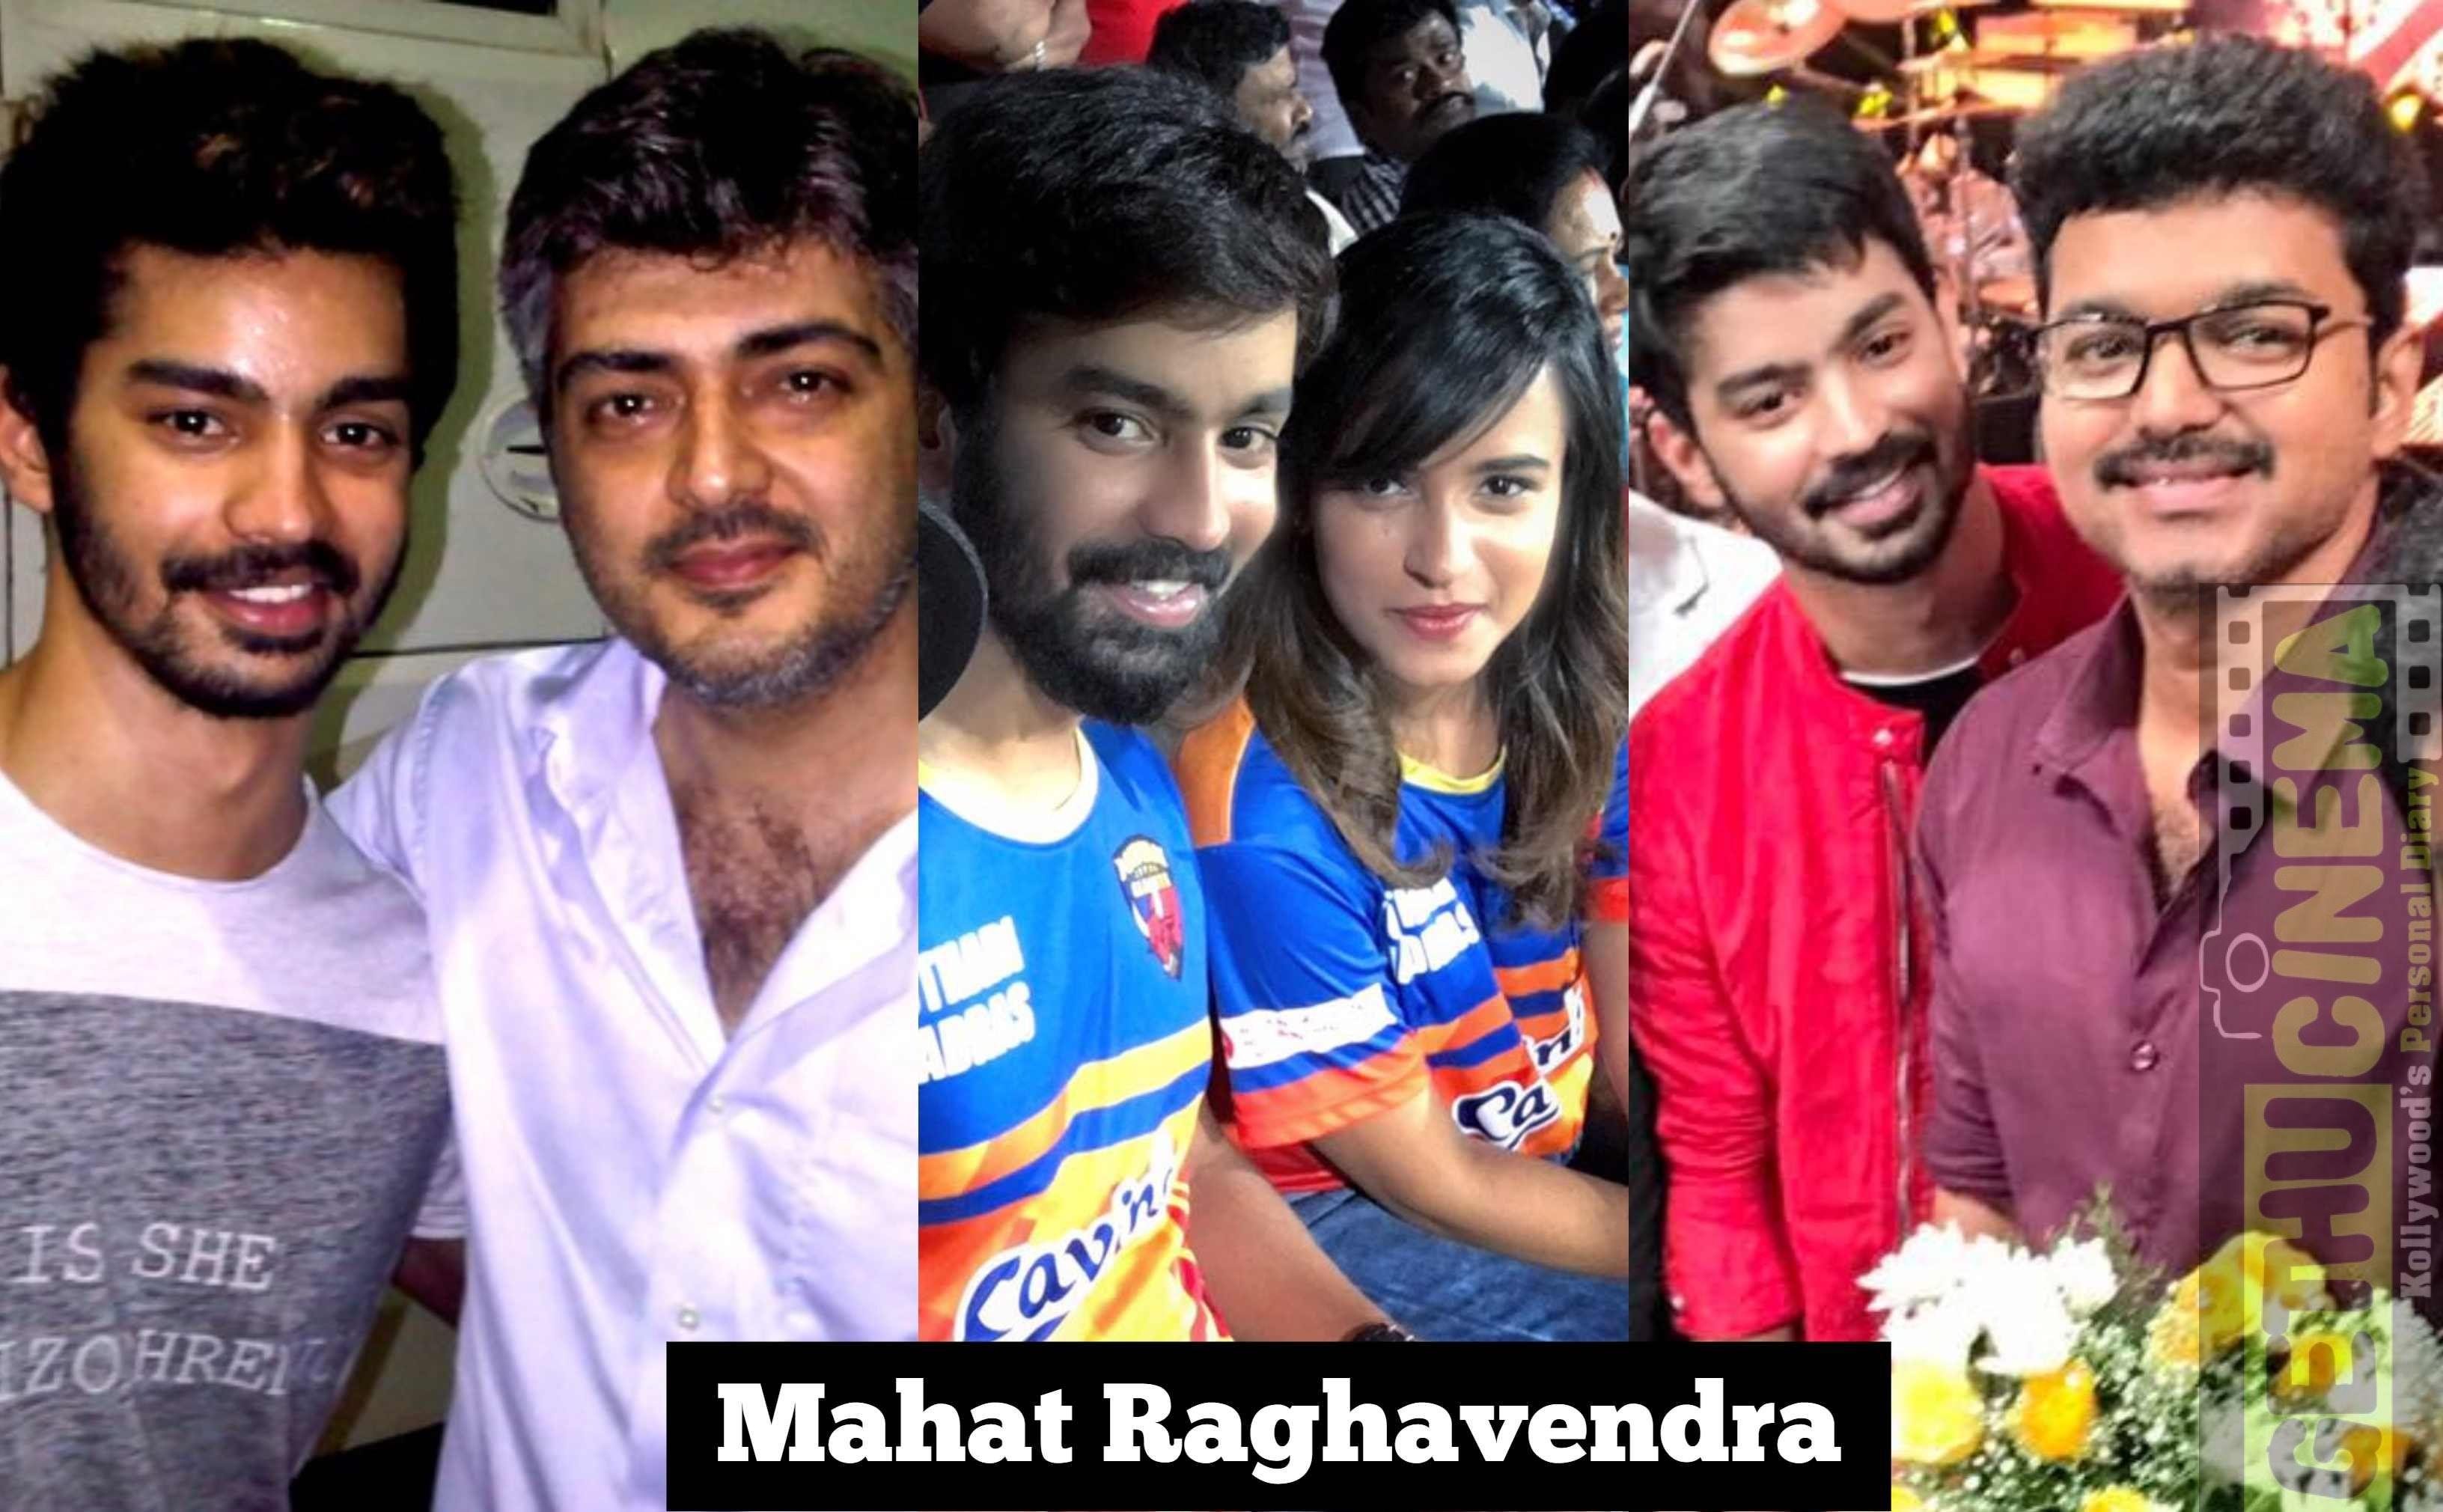 Bigg Boss Tamil 2 Contestant Mahat Raghavendra 2018 HD Images